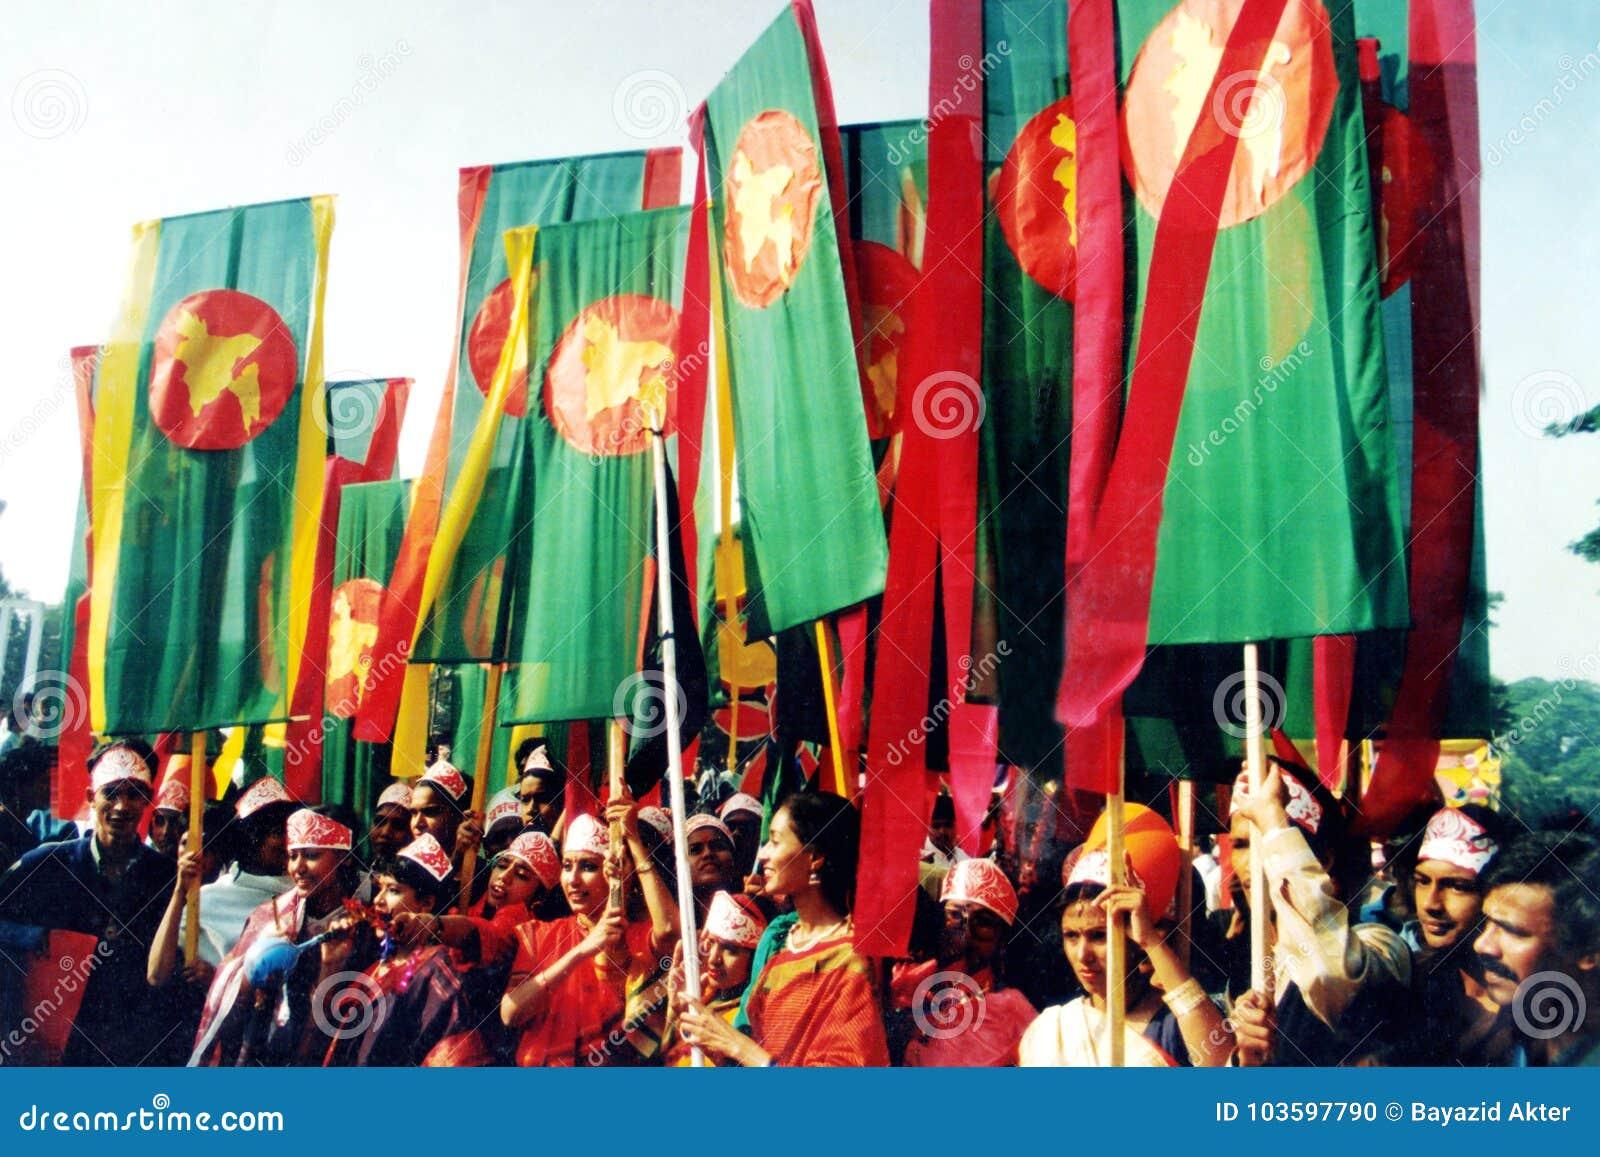 Bangli Buteful Dhaka Xx